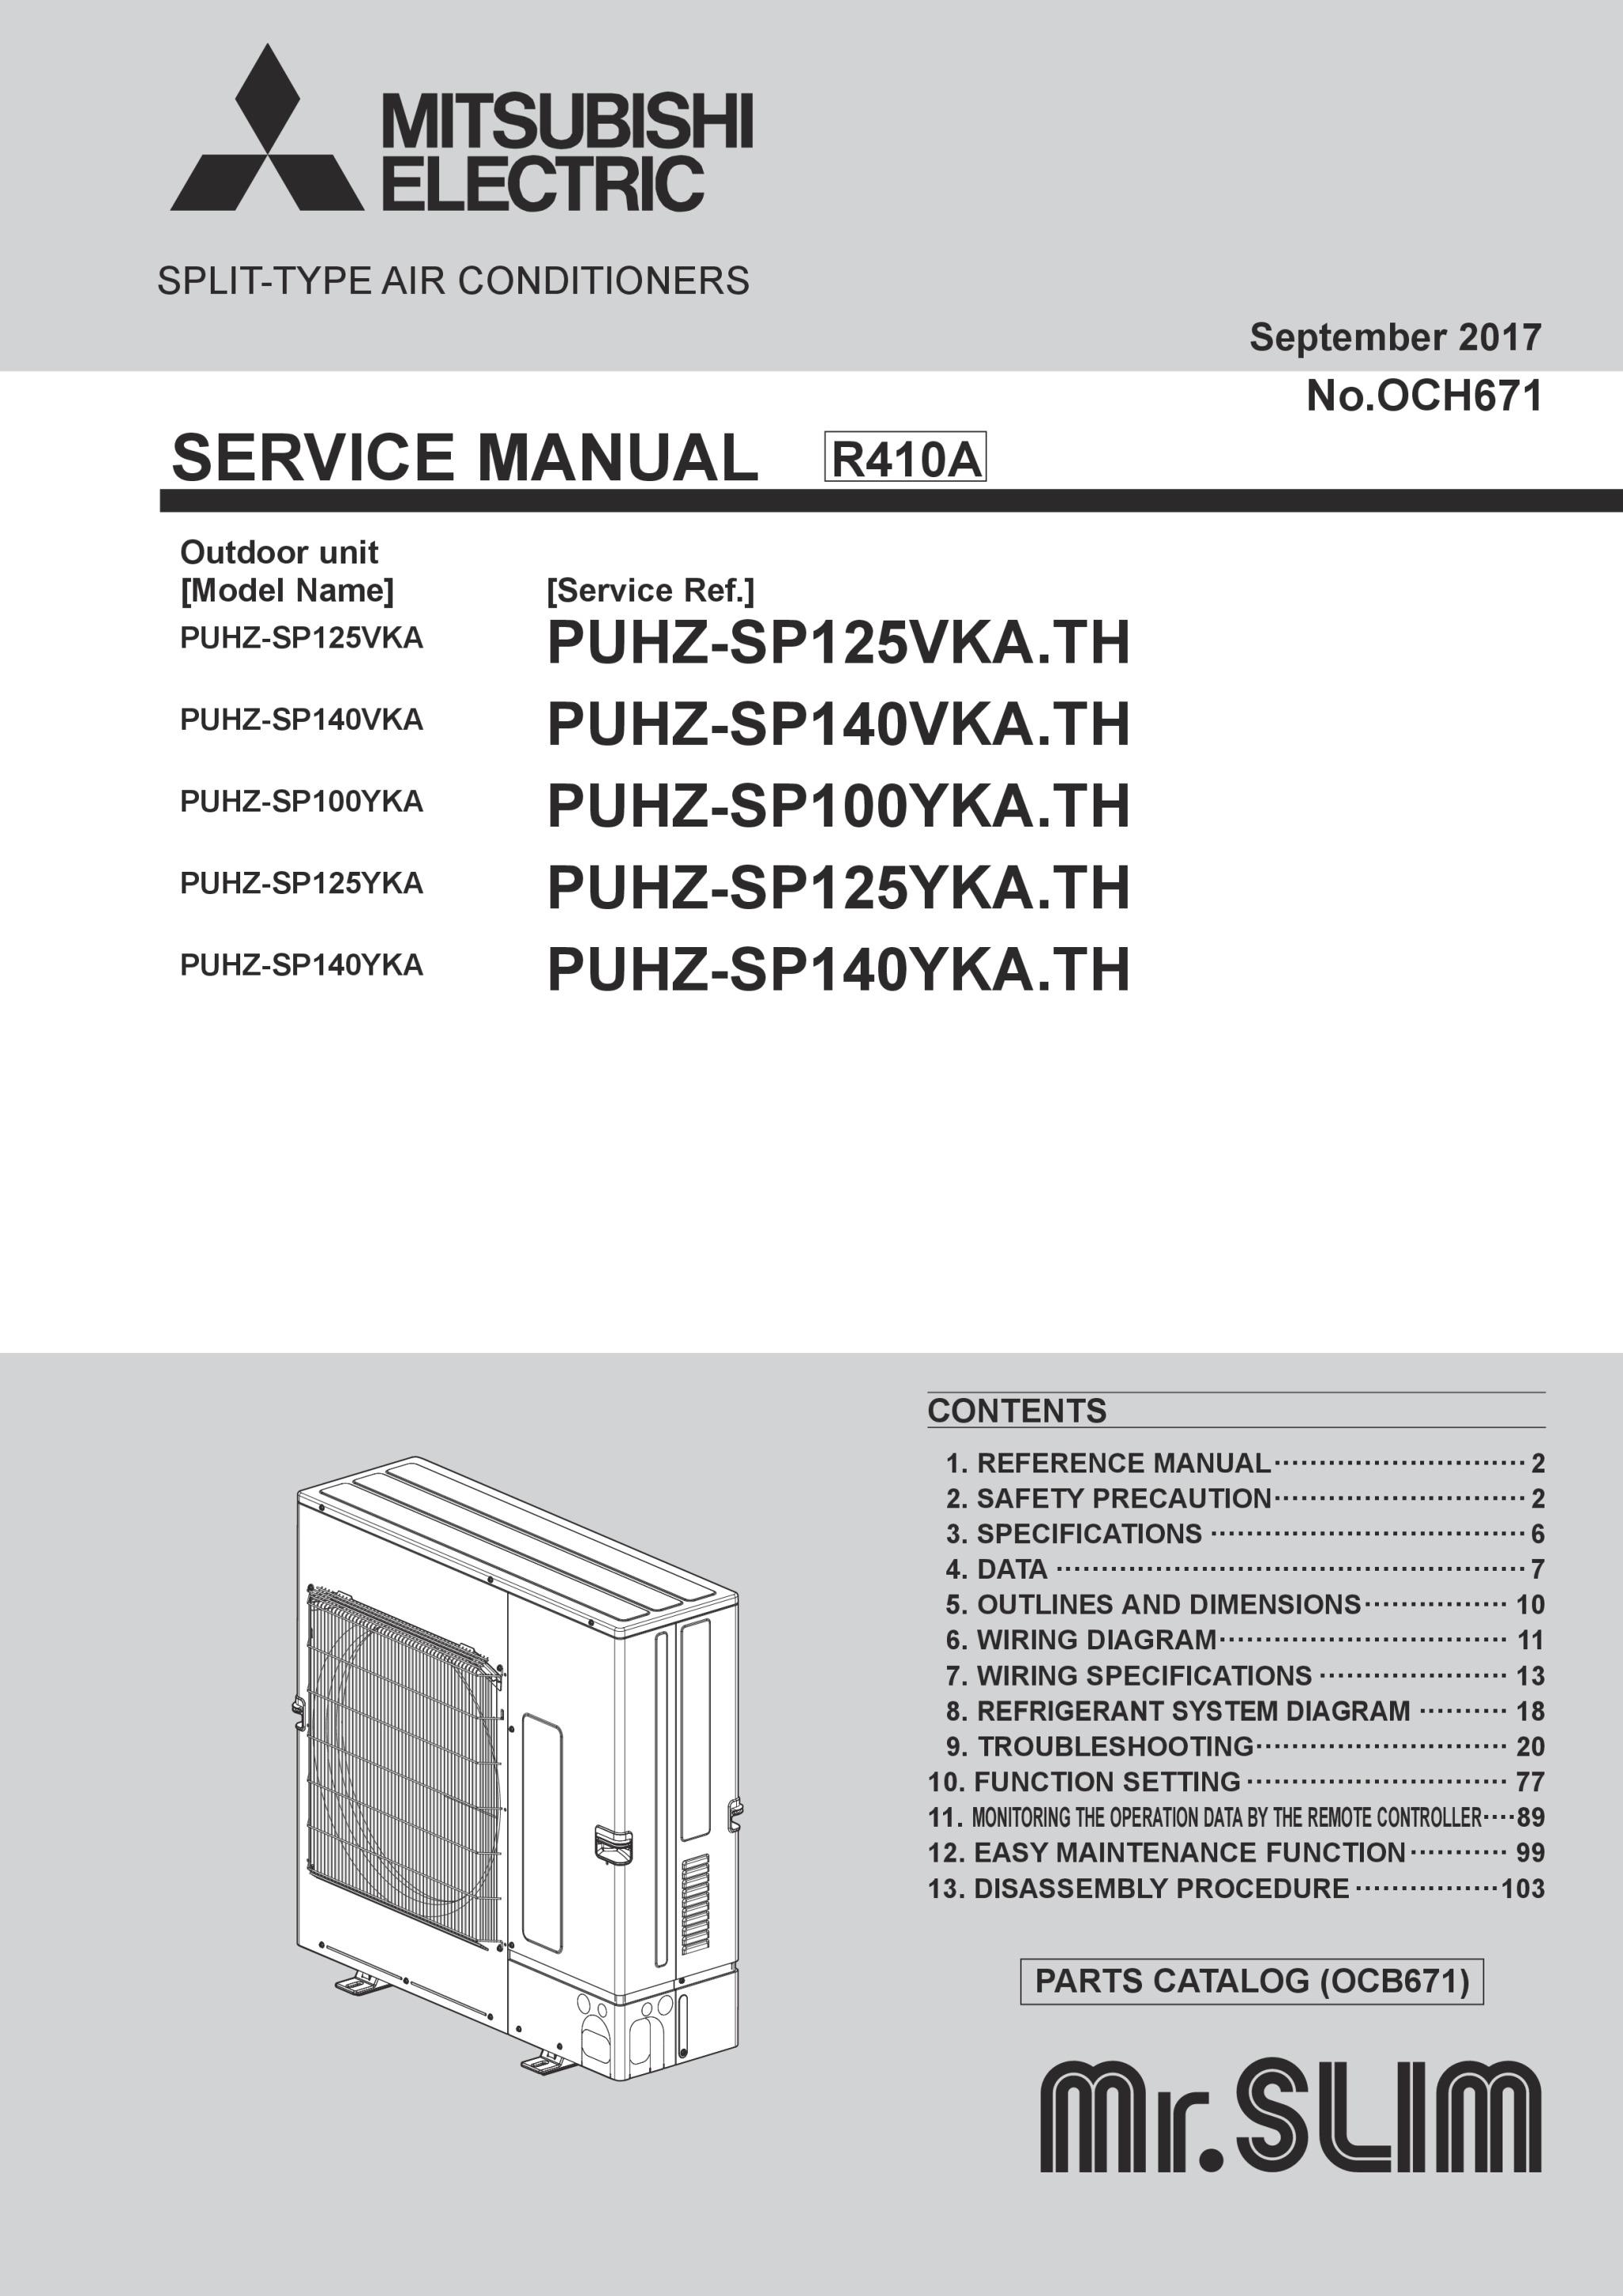 Mitsubishi Minicab Wiring Diagram Schematic Diagrams Mini Truck U62t News U2022 Lancer Ac System